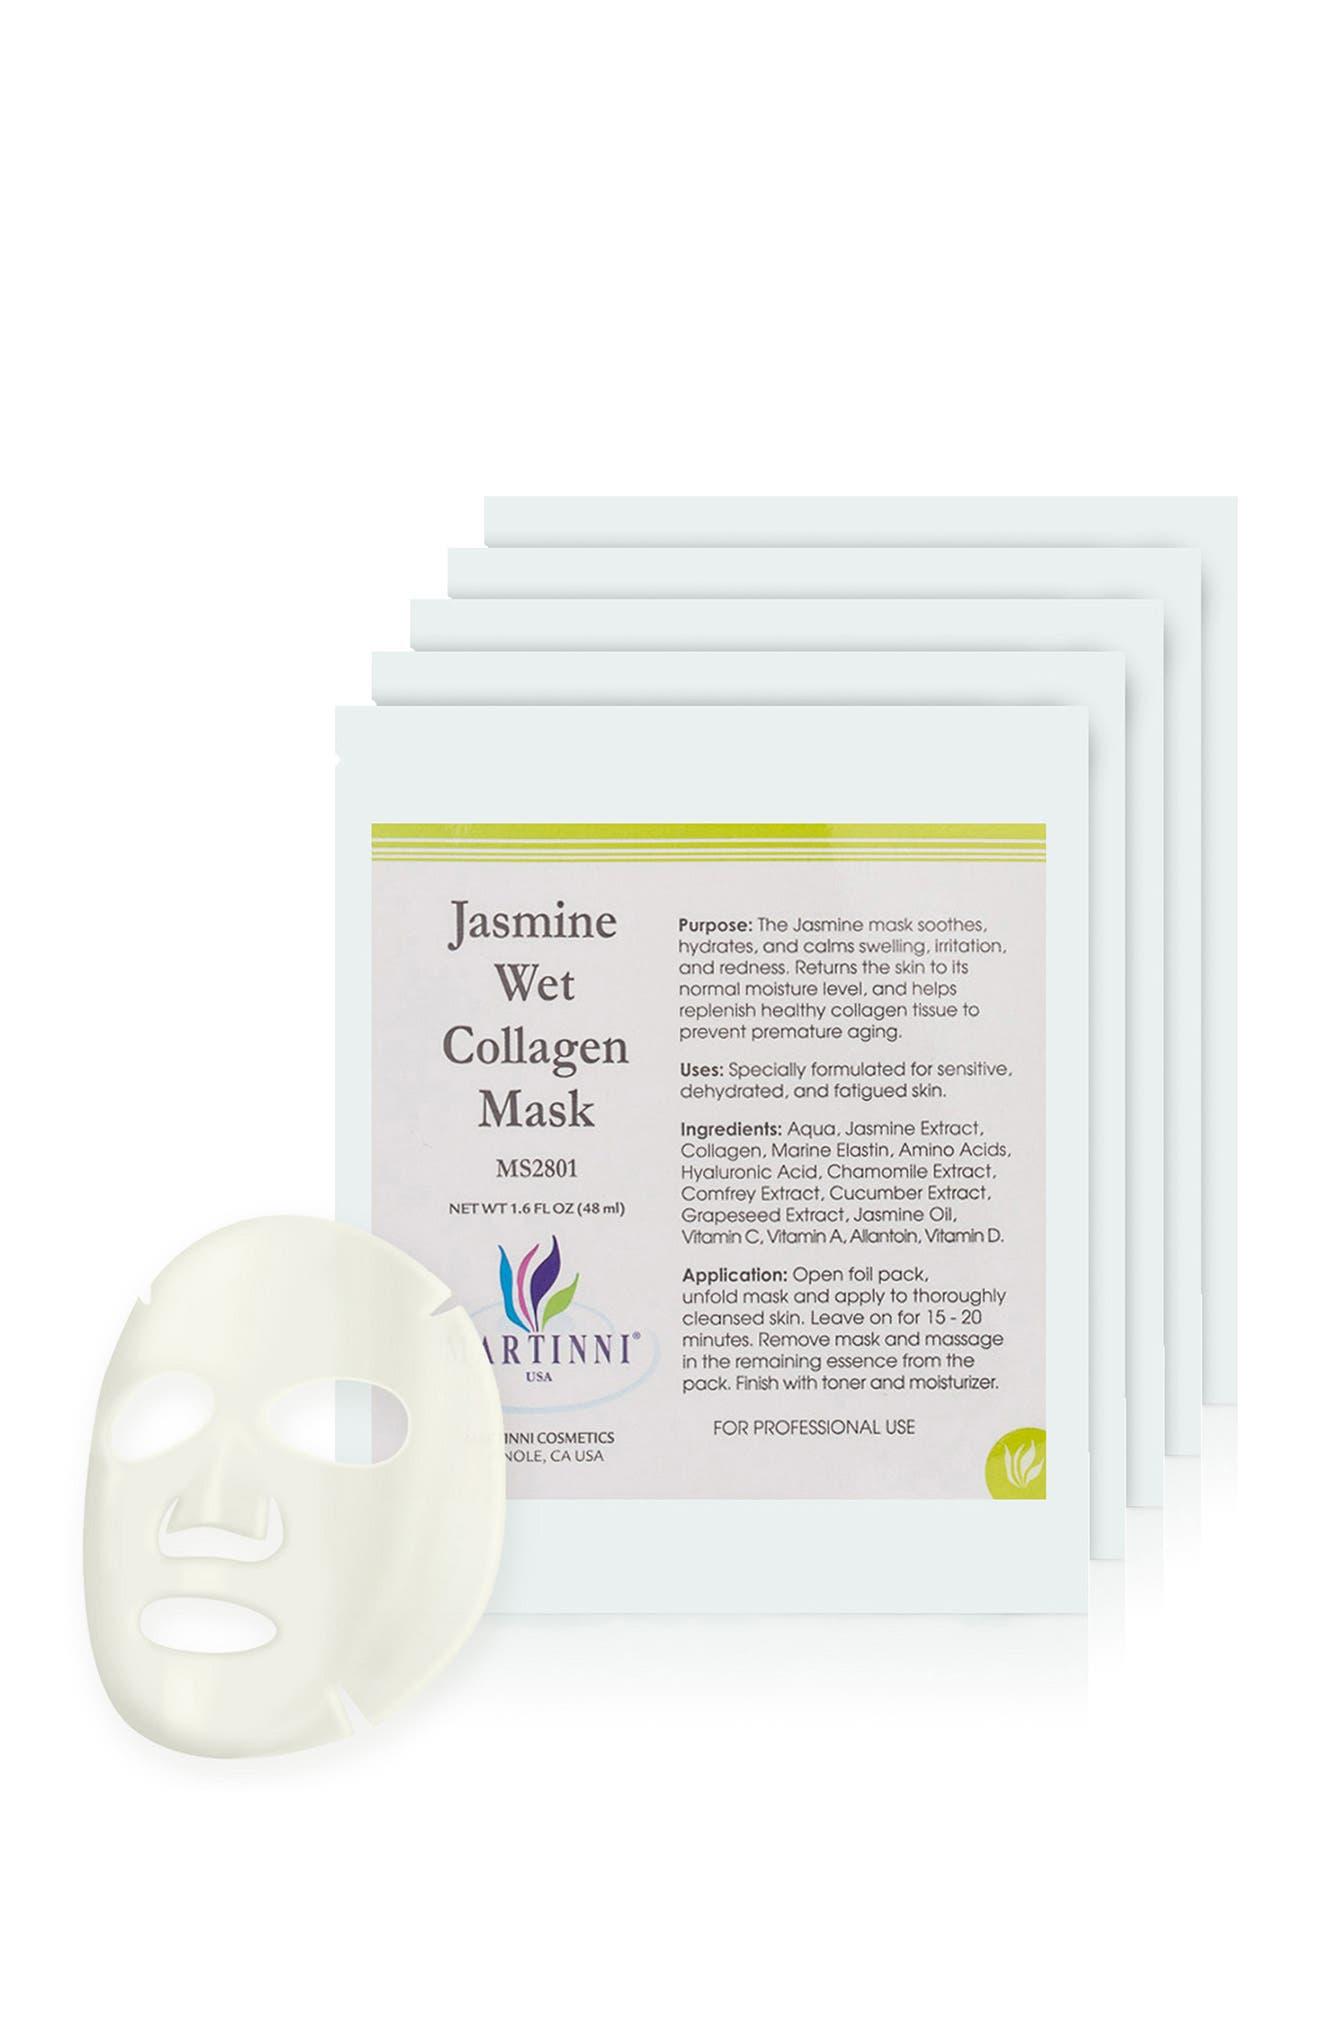 Image of MARTINNI MASKS Jasmine Wet Collagen Mask - Pack of 5